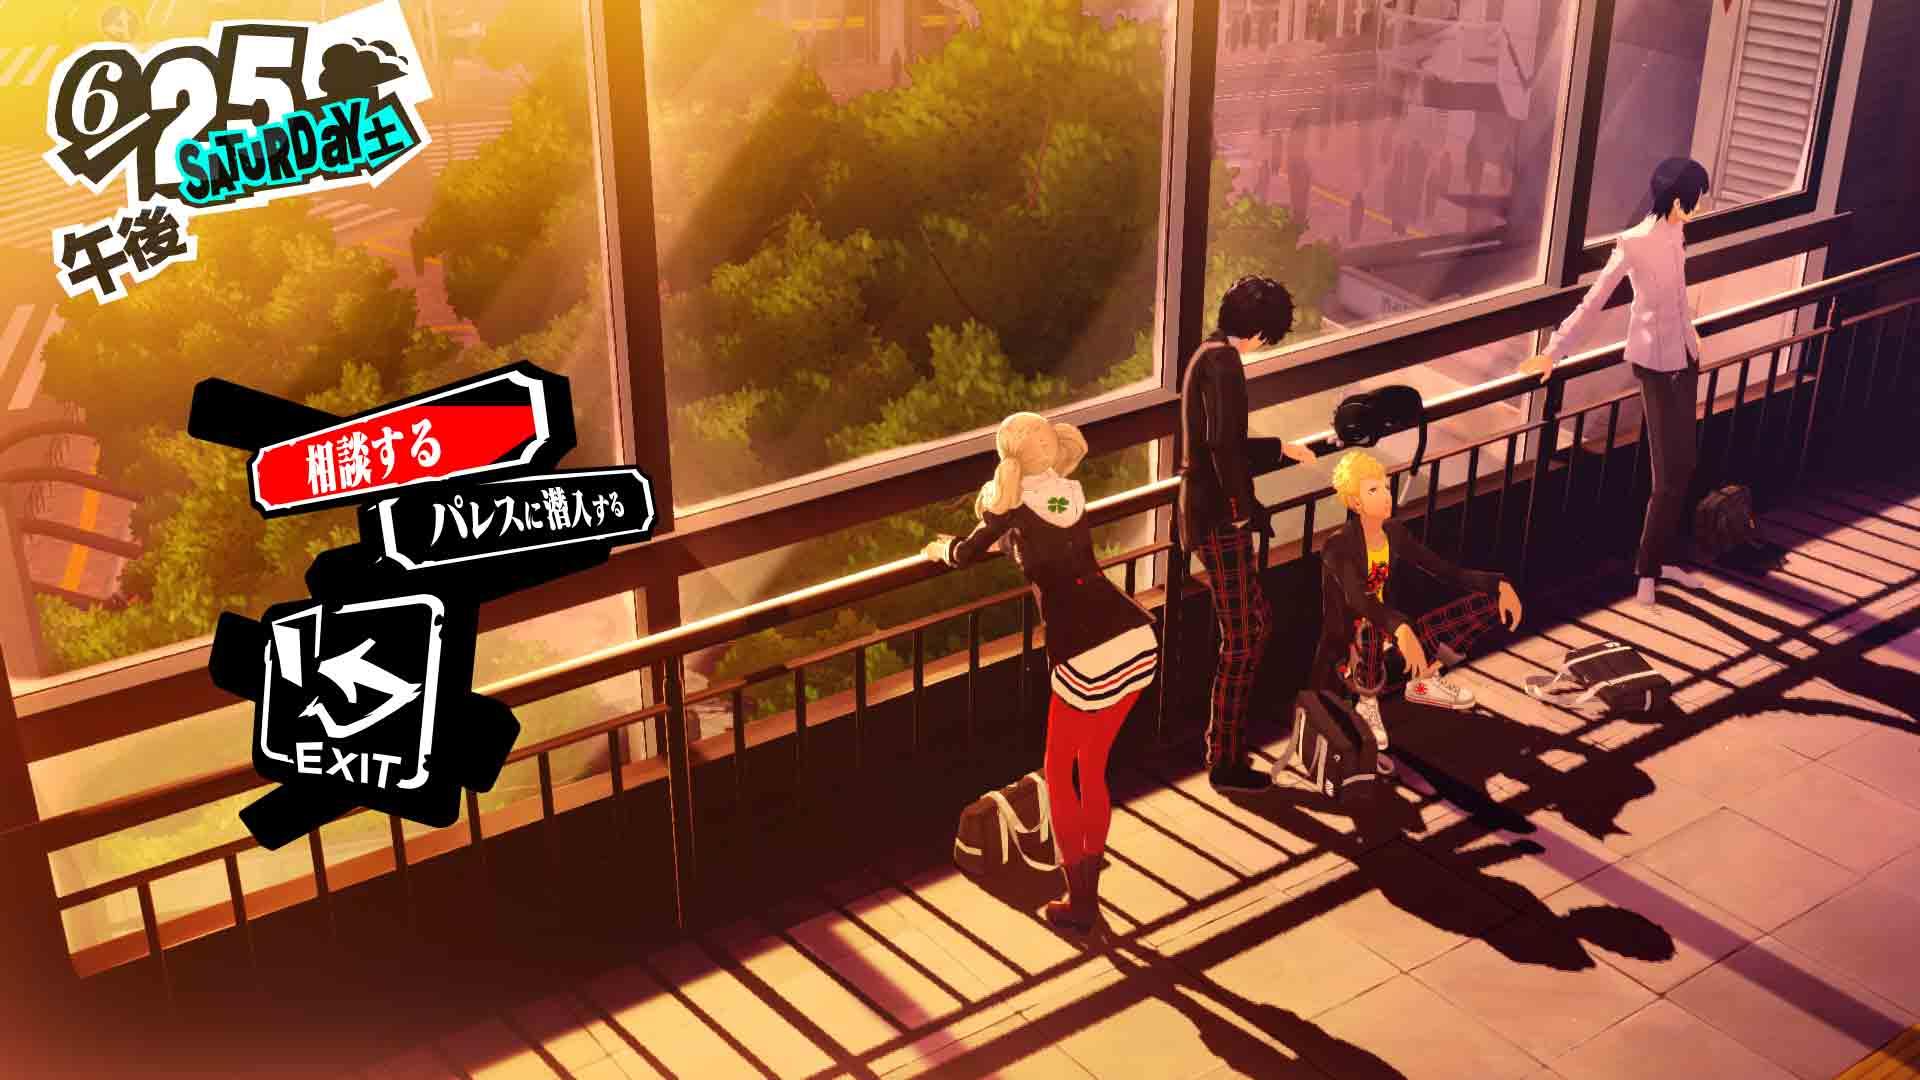 Persona 5 gameplay E3